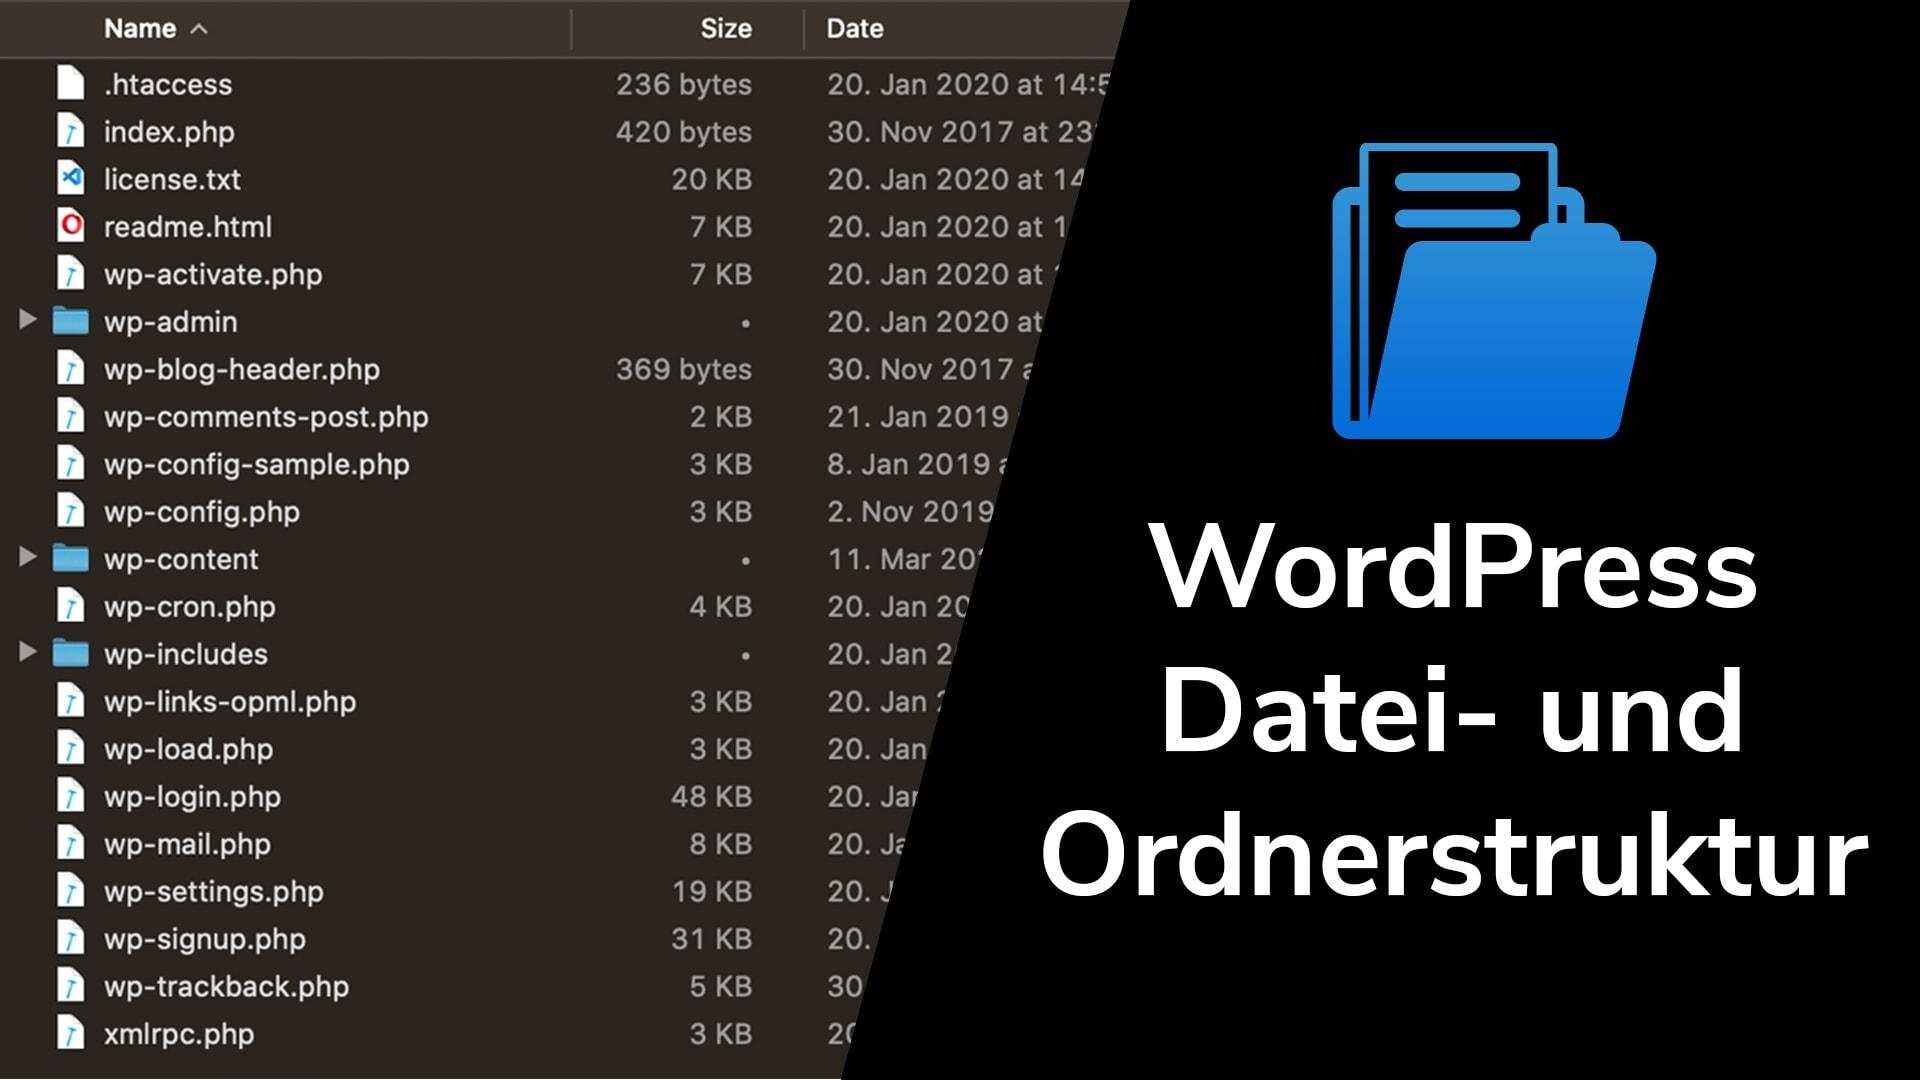 WordPress-Ordnerstruktur: wp-content/ Ordnerstruktur